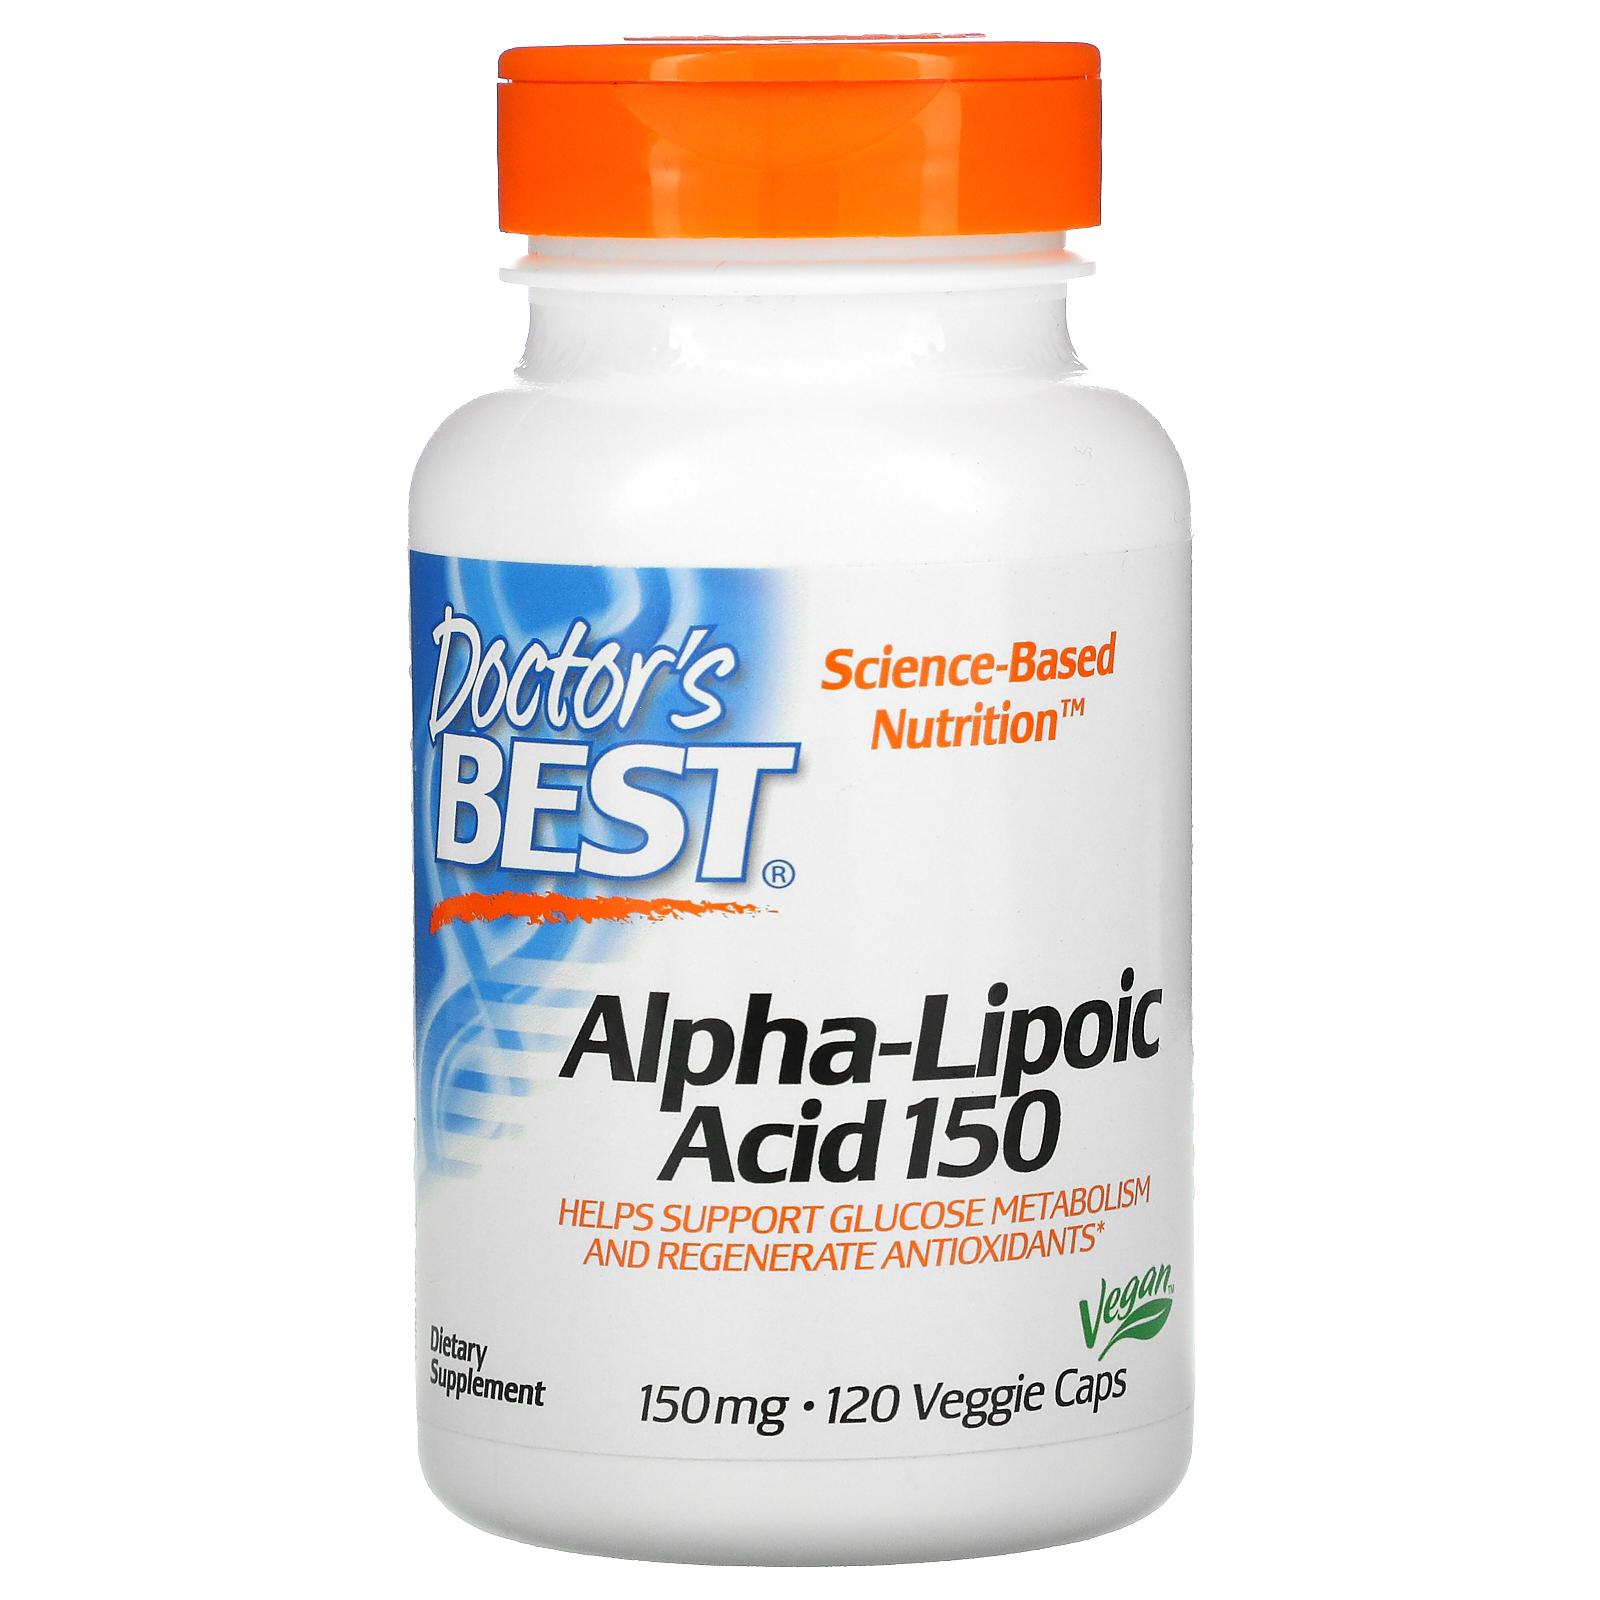 Doctor's Best Alpha-Lipoic Acid 120 vcaps